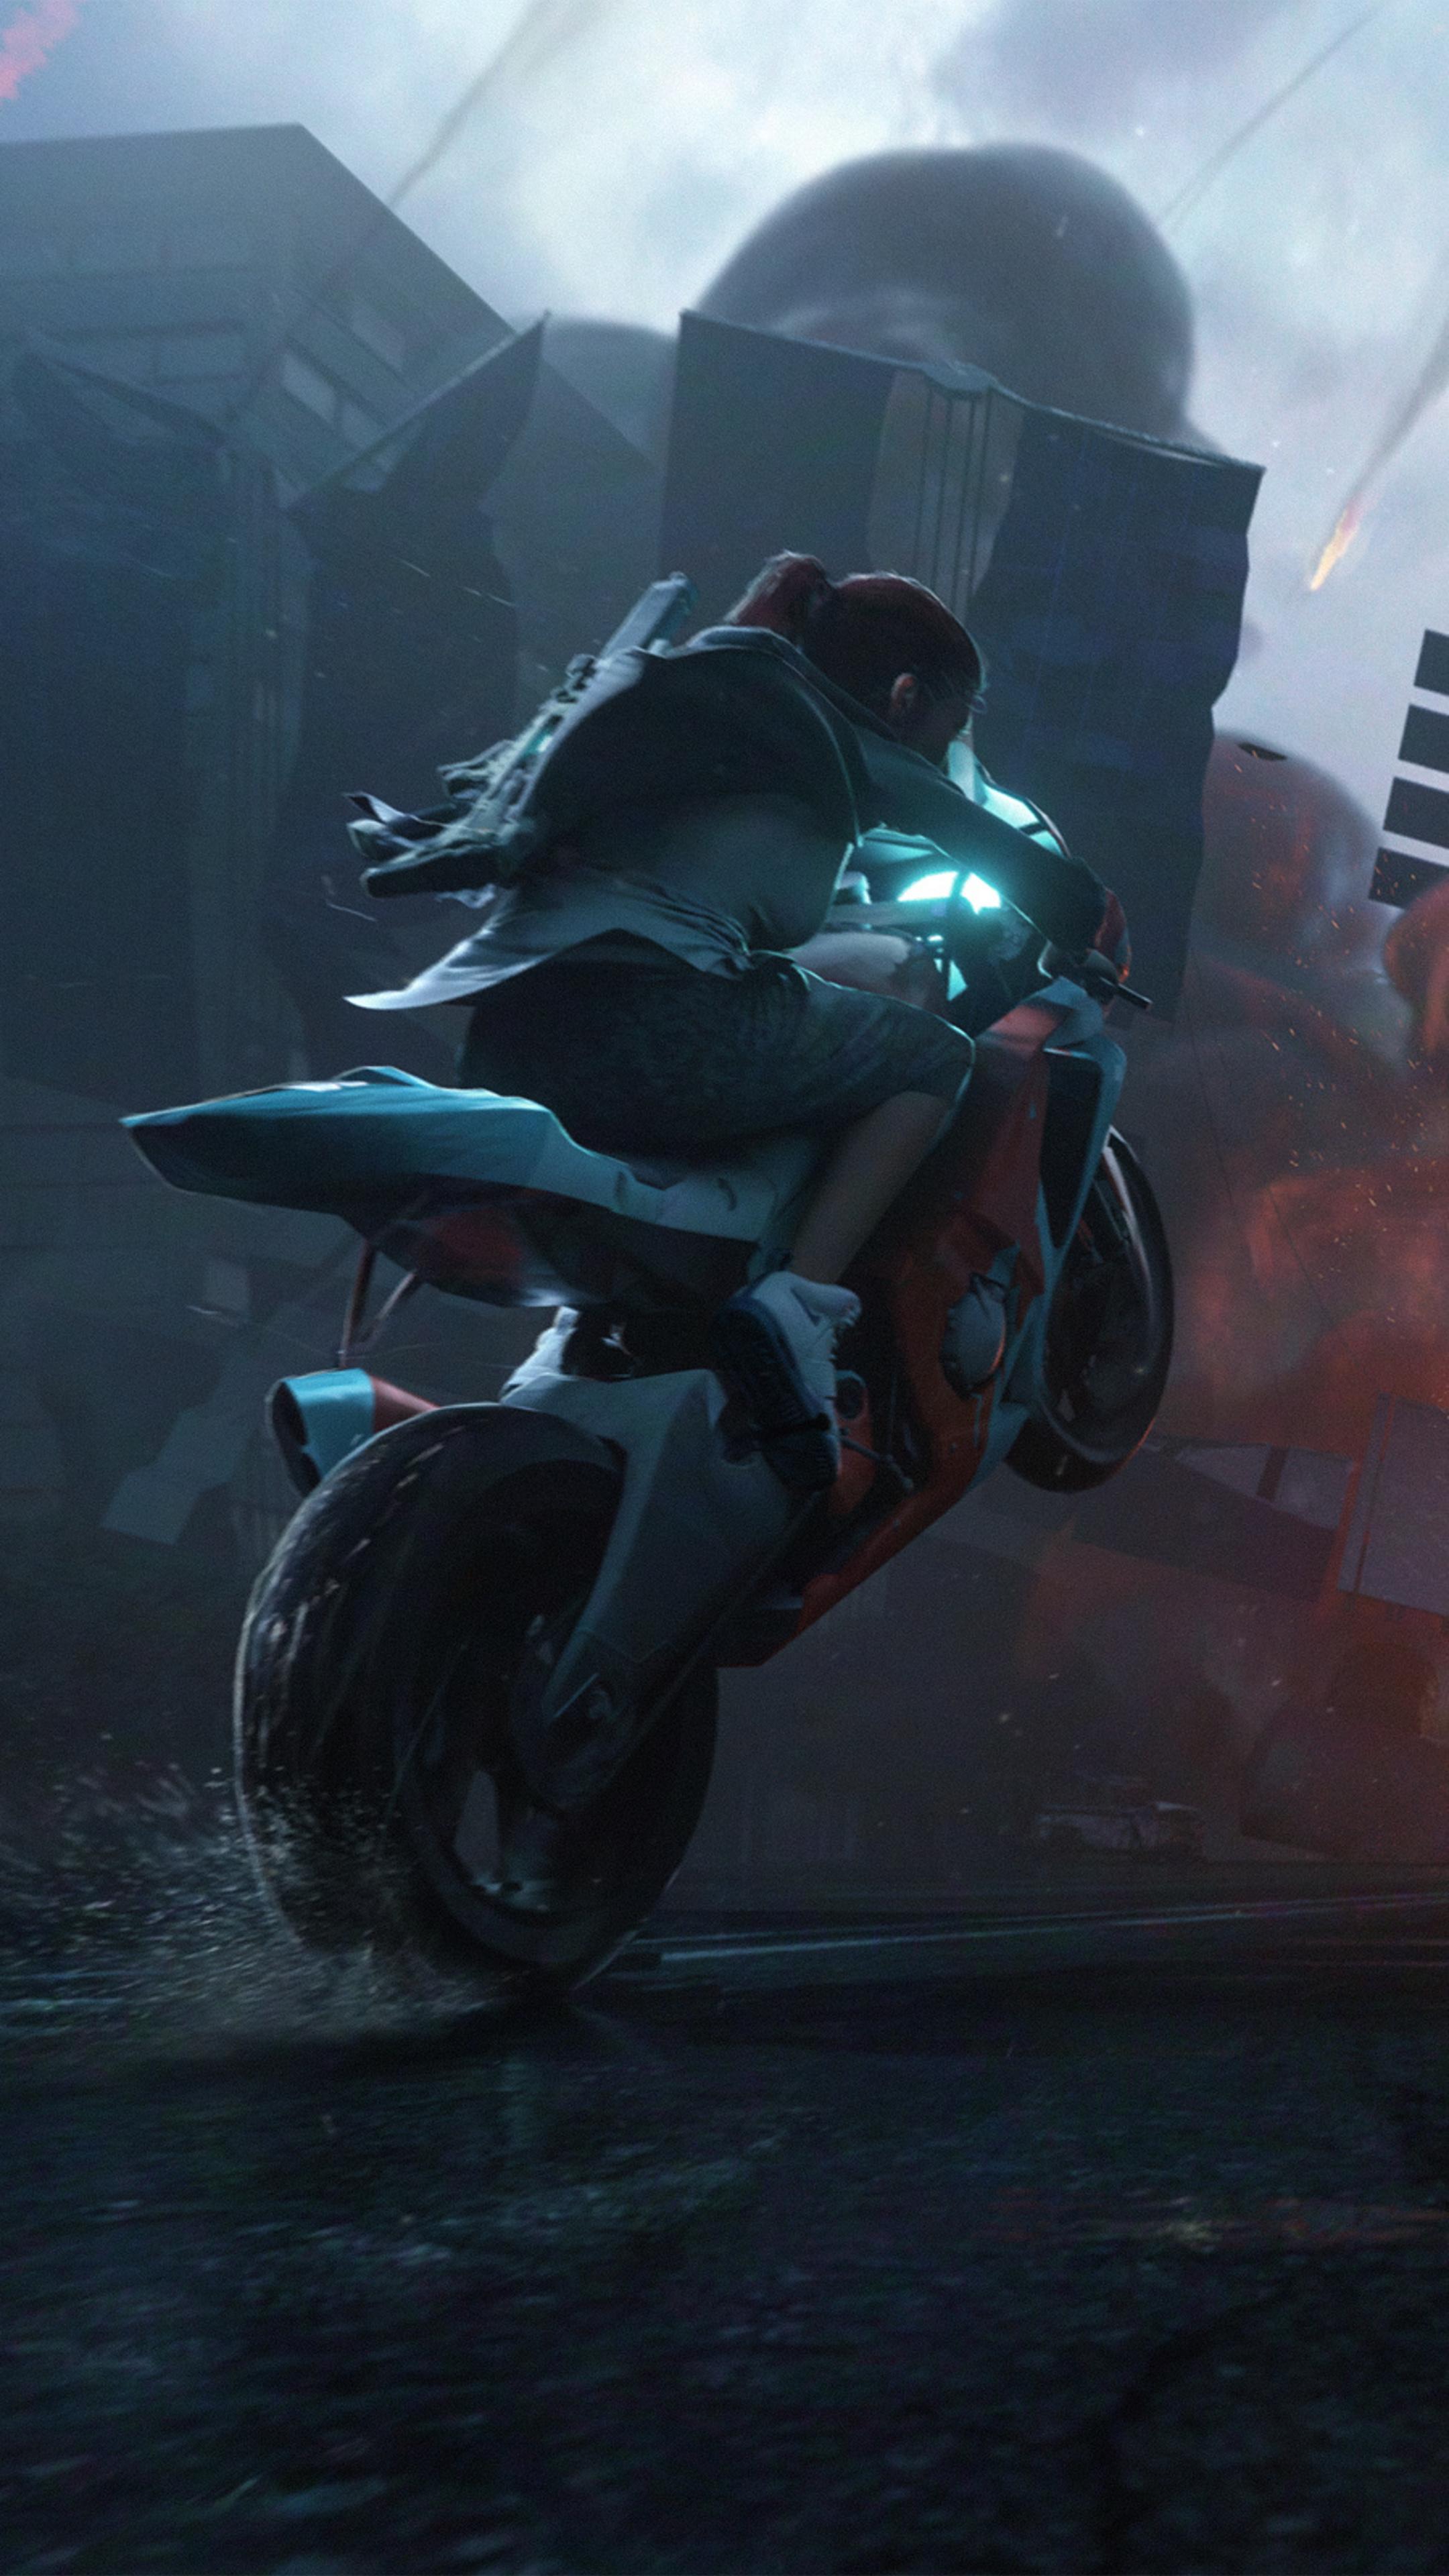 biker-girl-chaos-sw.jpg